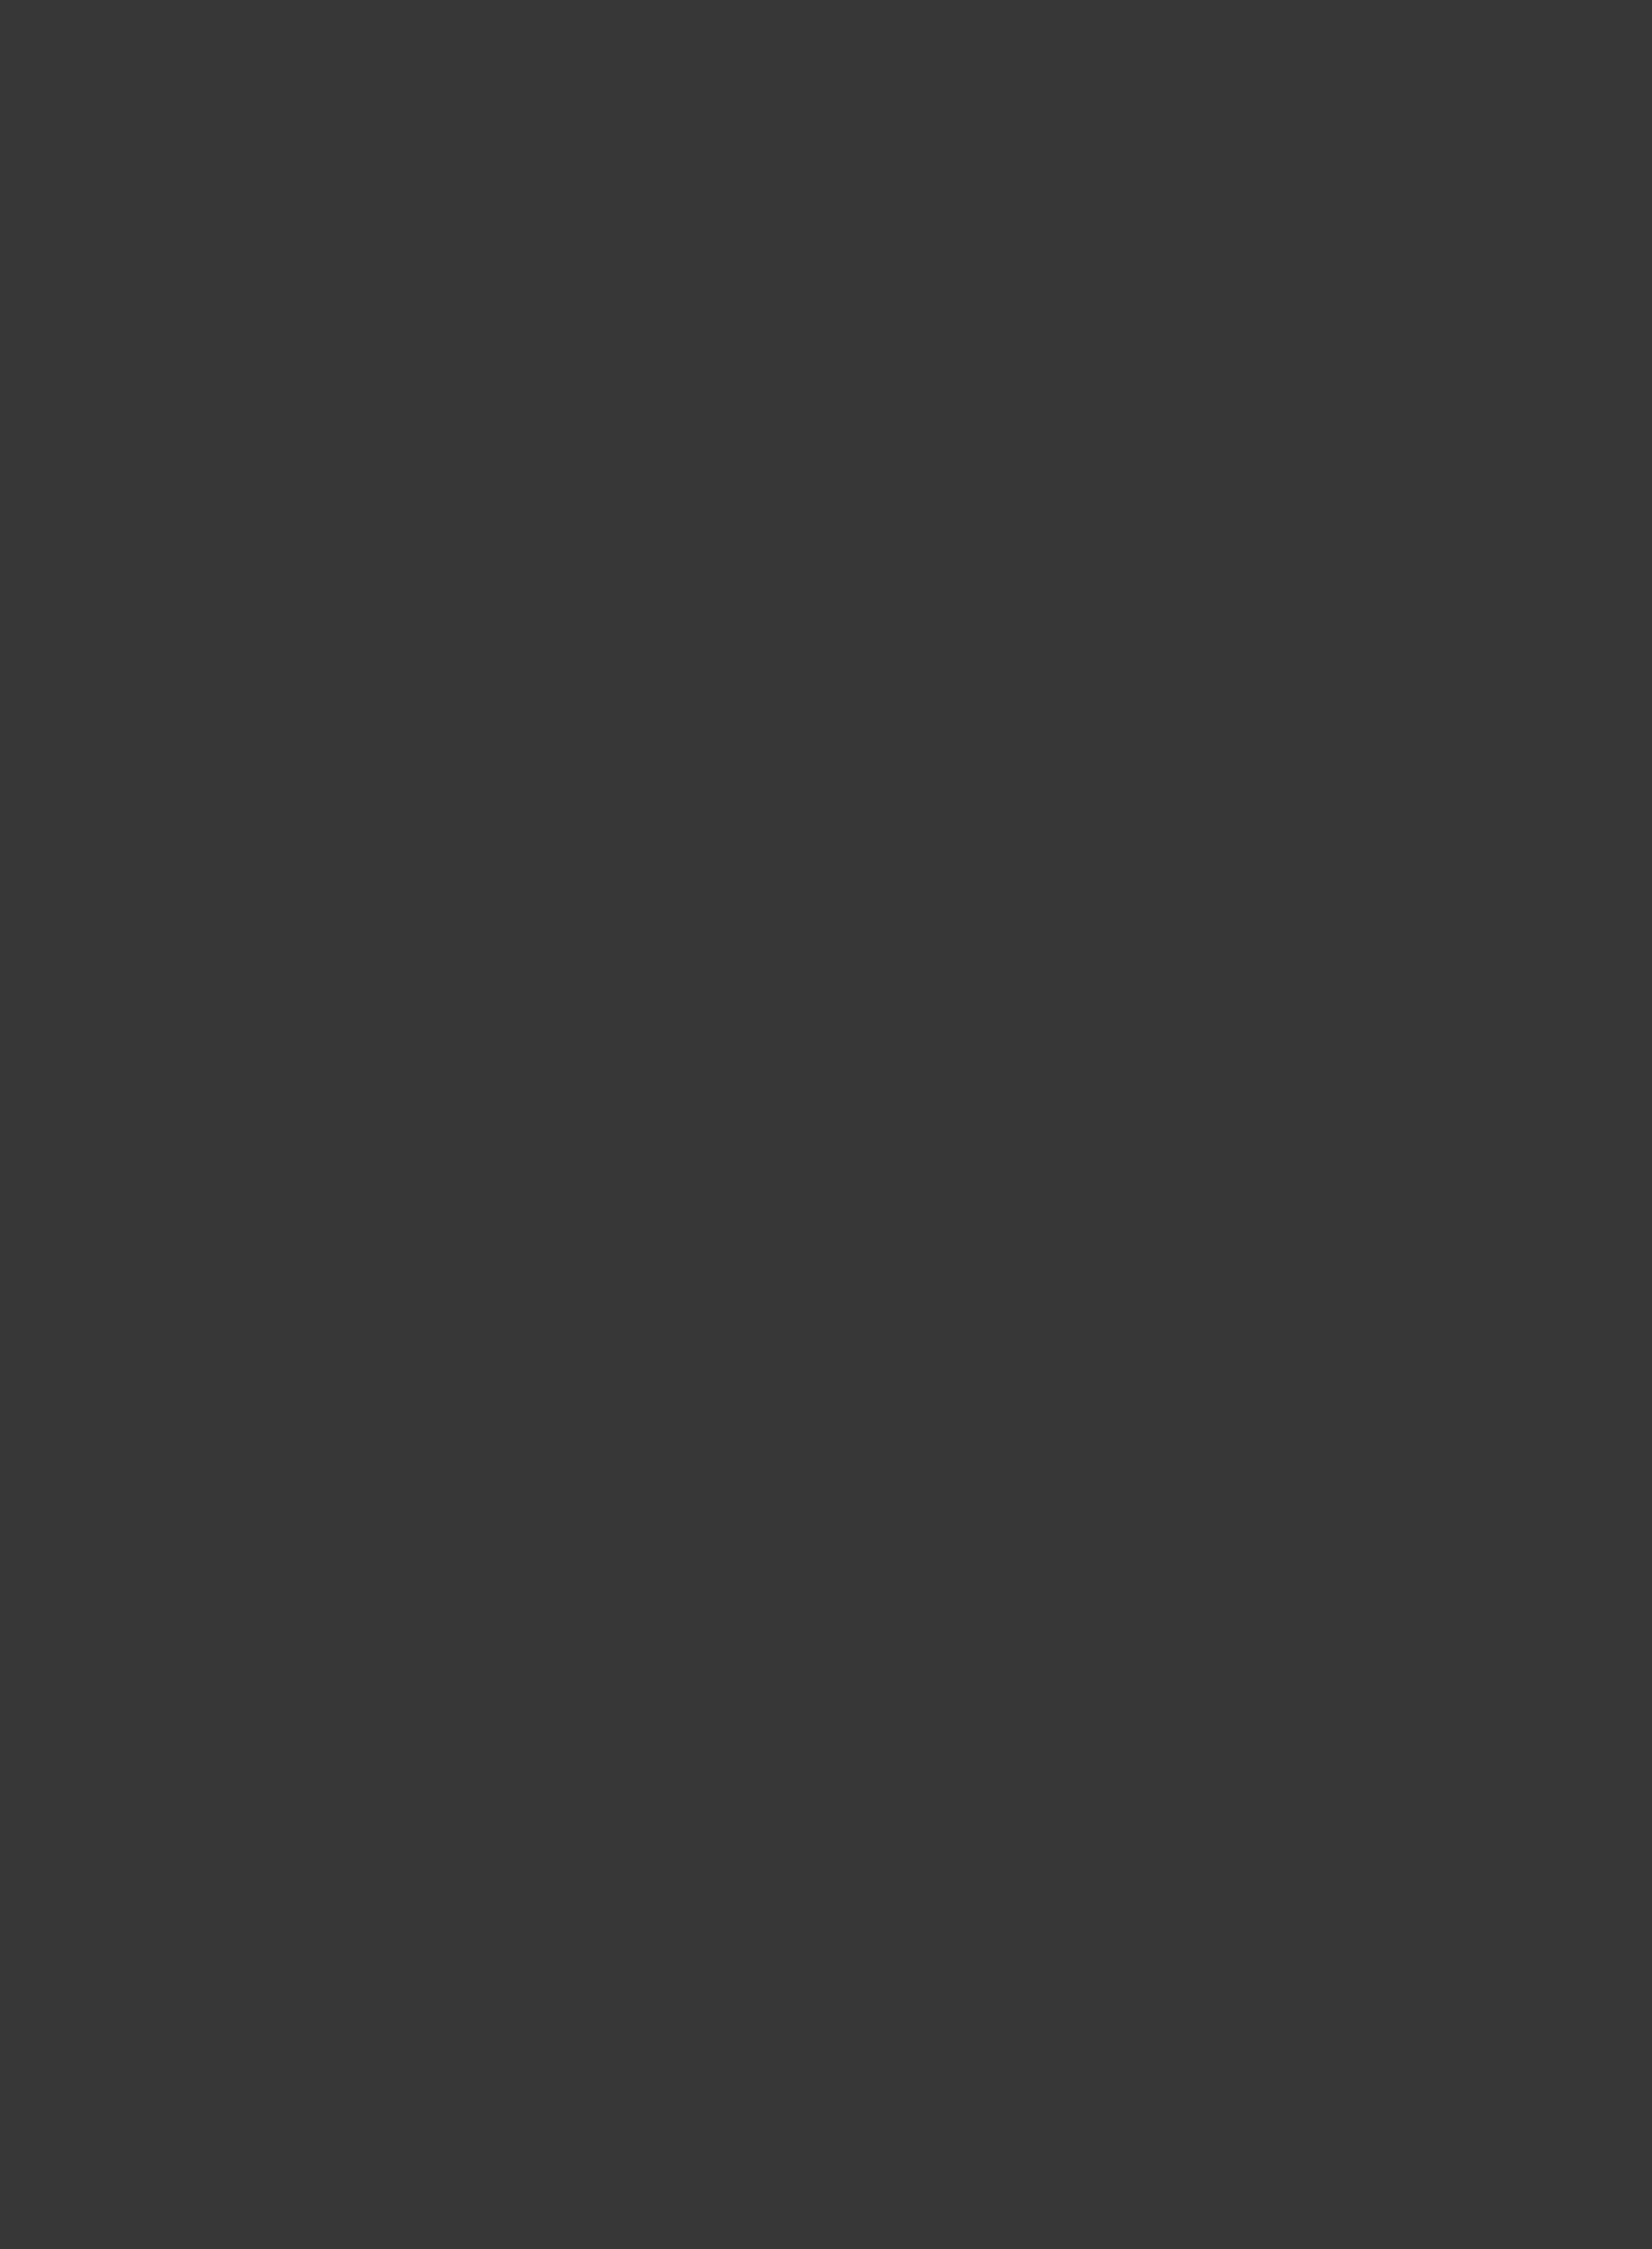 DecoLegno HM07 Piombo hele plaatafb. 2800x2070 mm / tekenprogramma